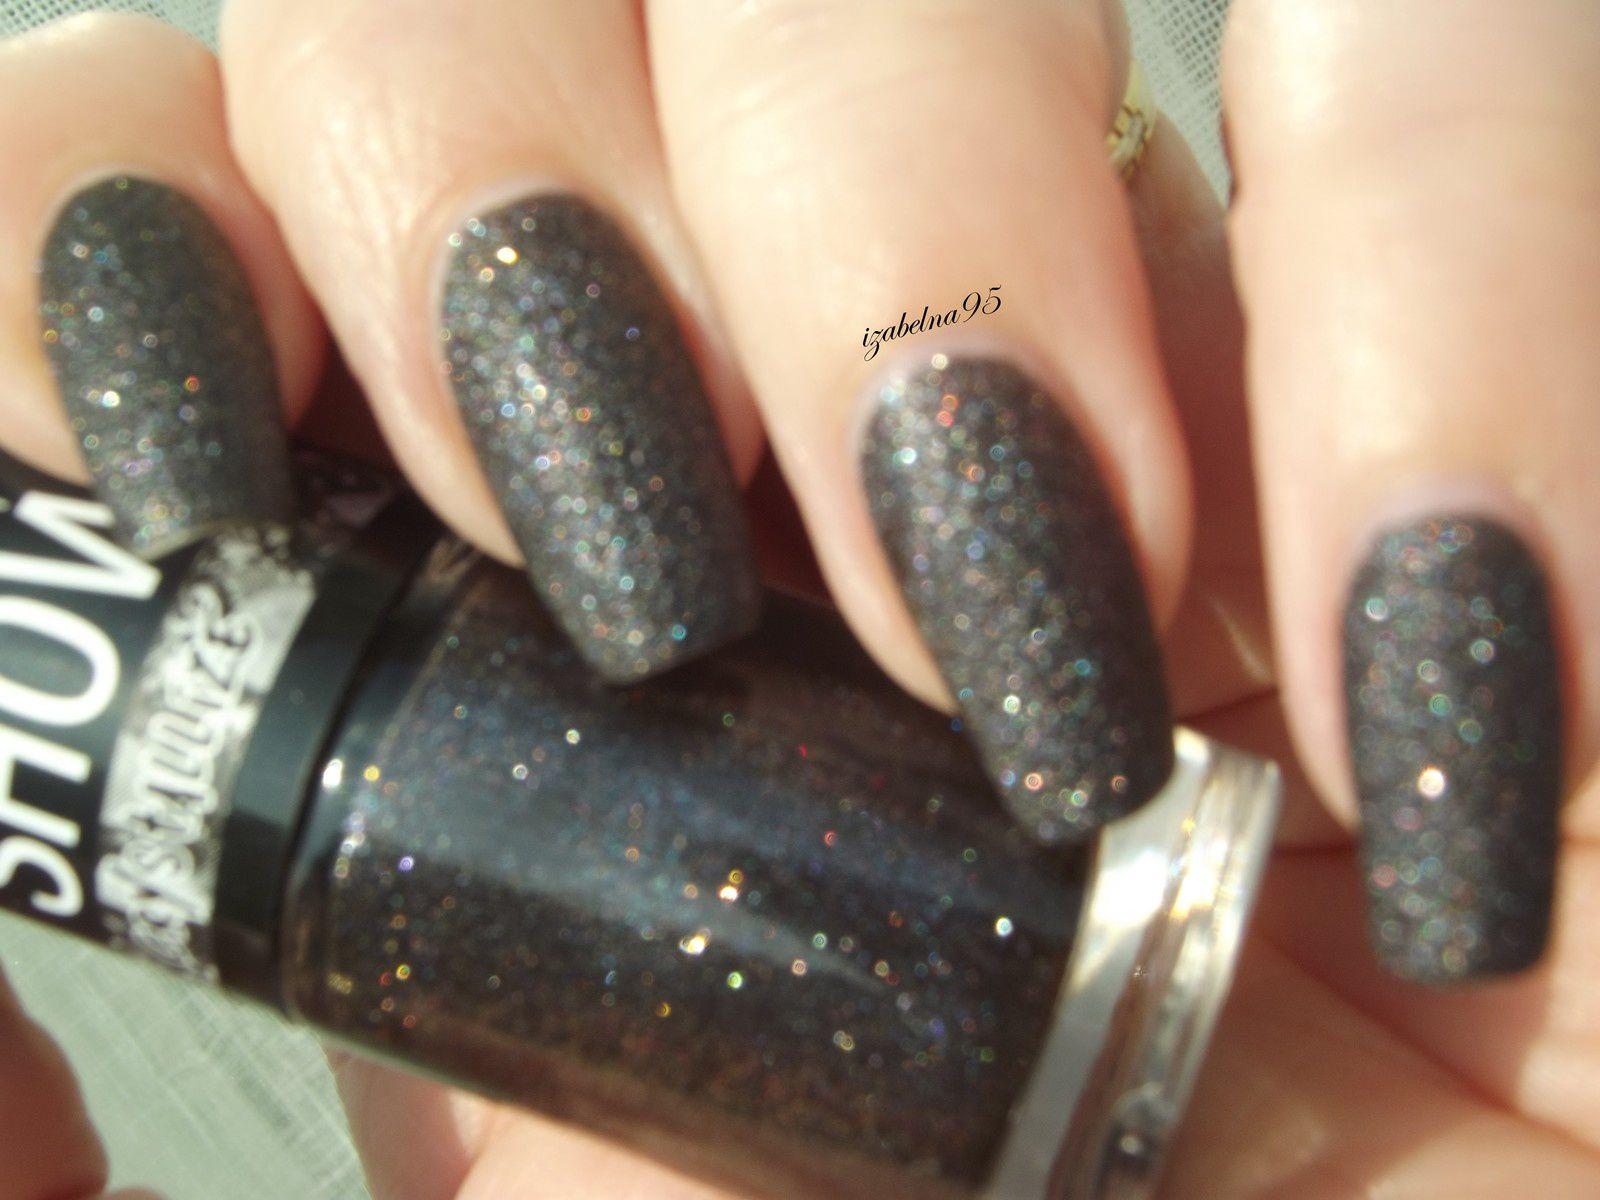 Swatch Color Show Maybelline &quot&#x3B;Aspet sable&quot&#x3B;